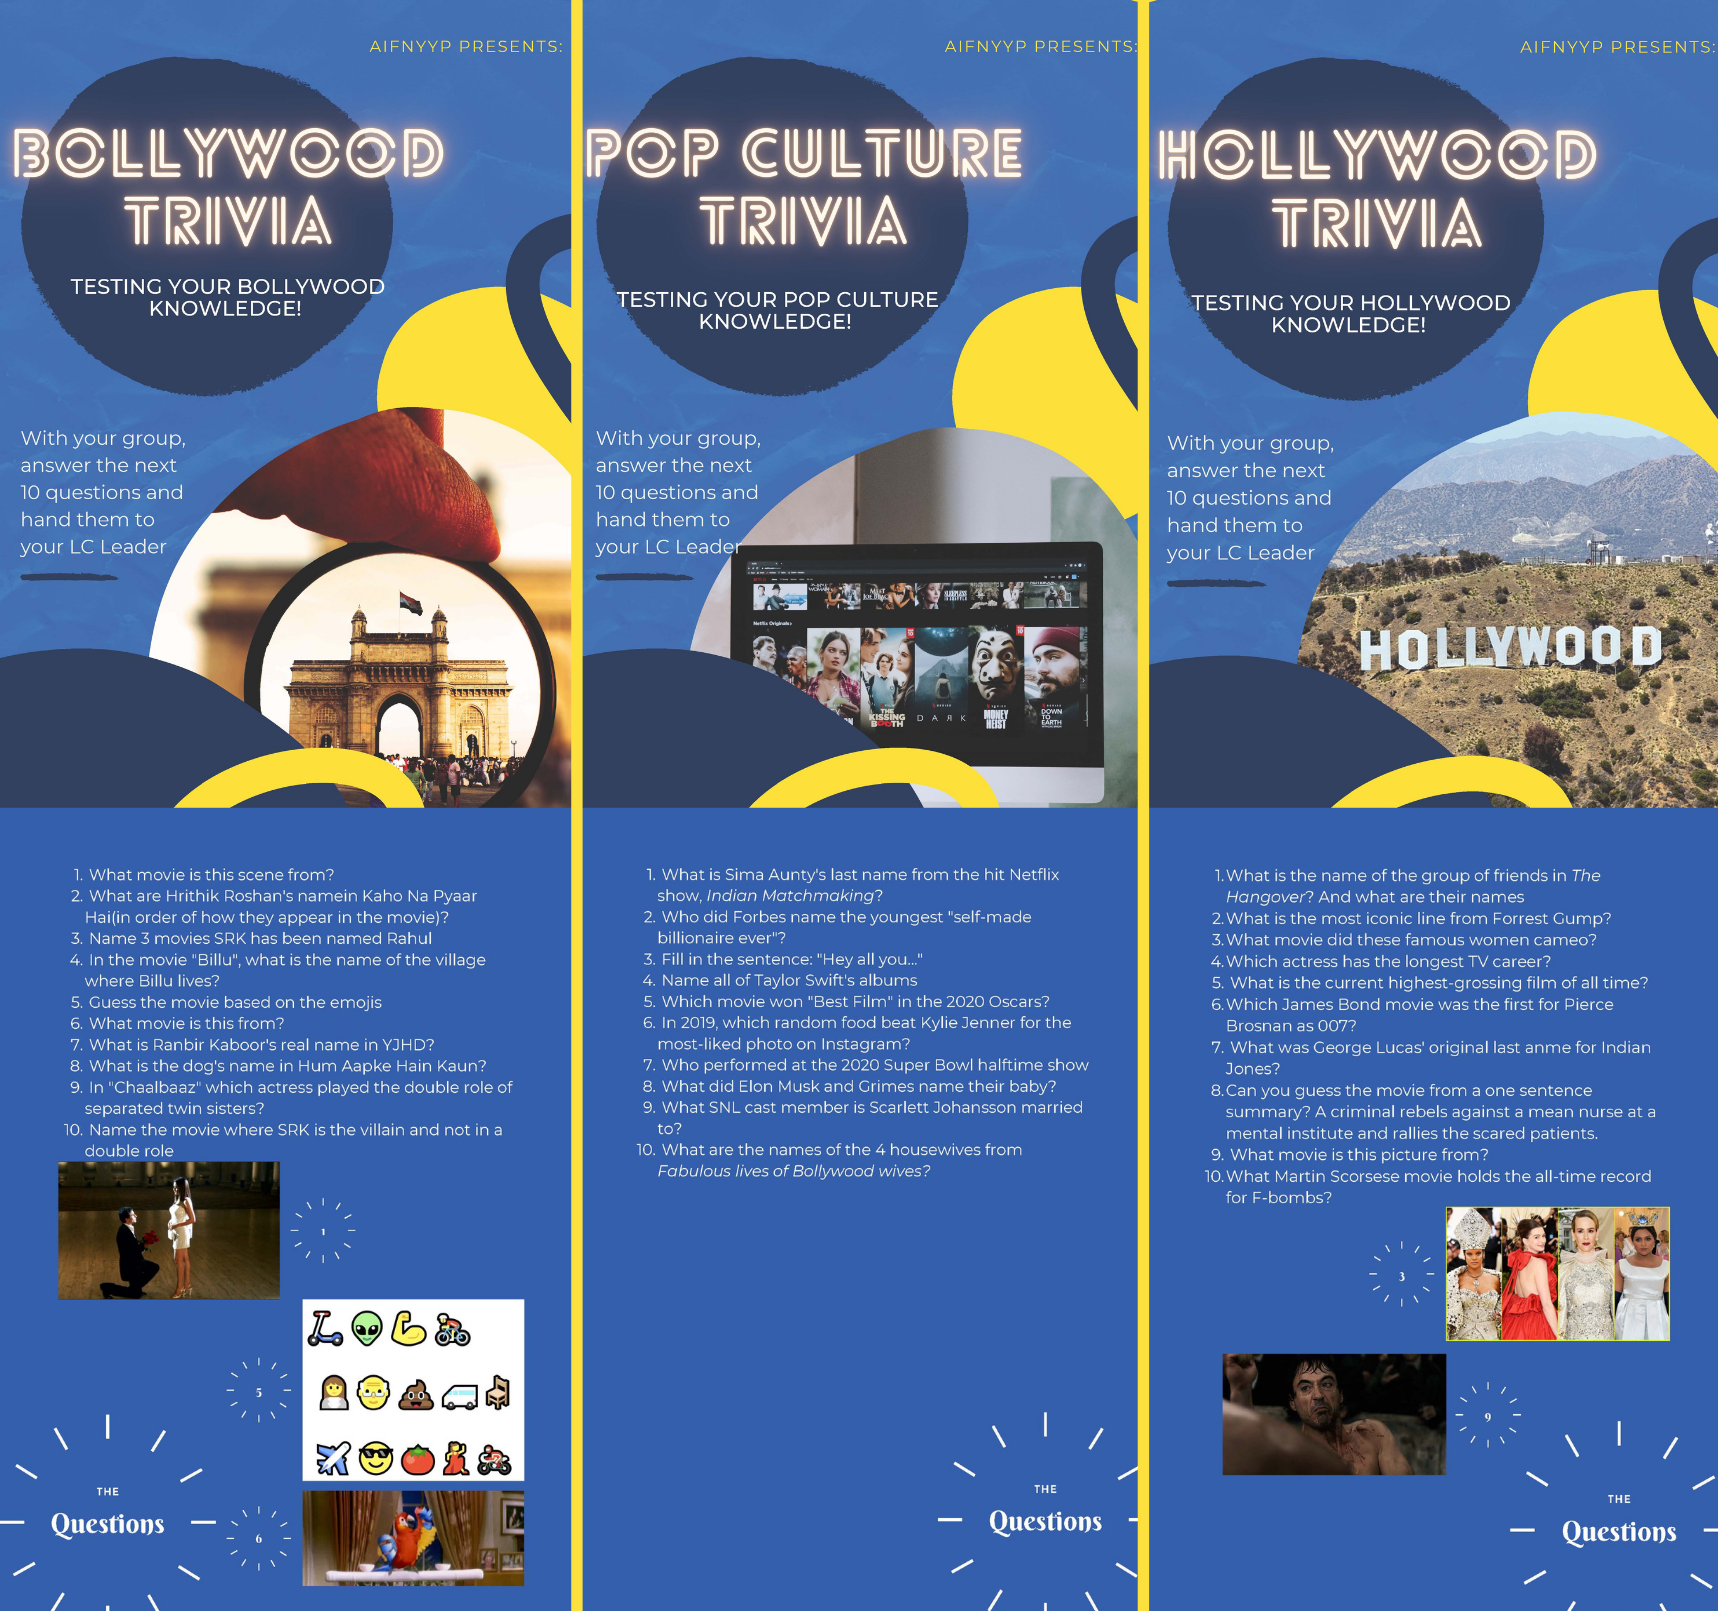 Categories: Bollywood Trivia, Pop Culture Trivia, Hollywood Trivia.